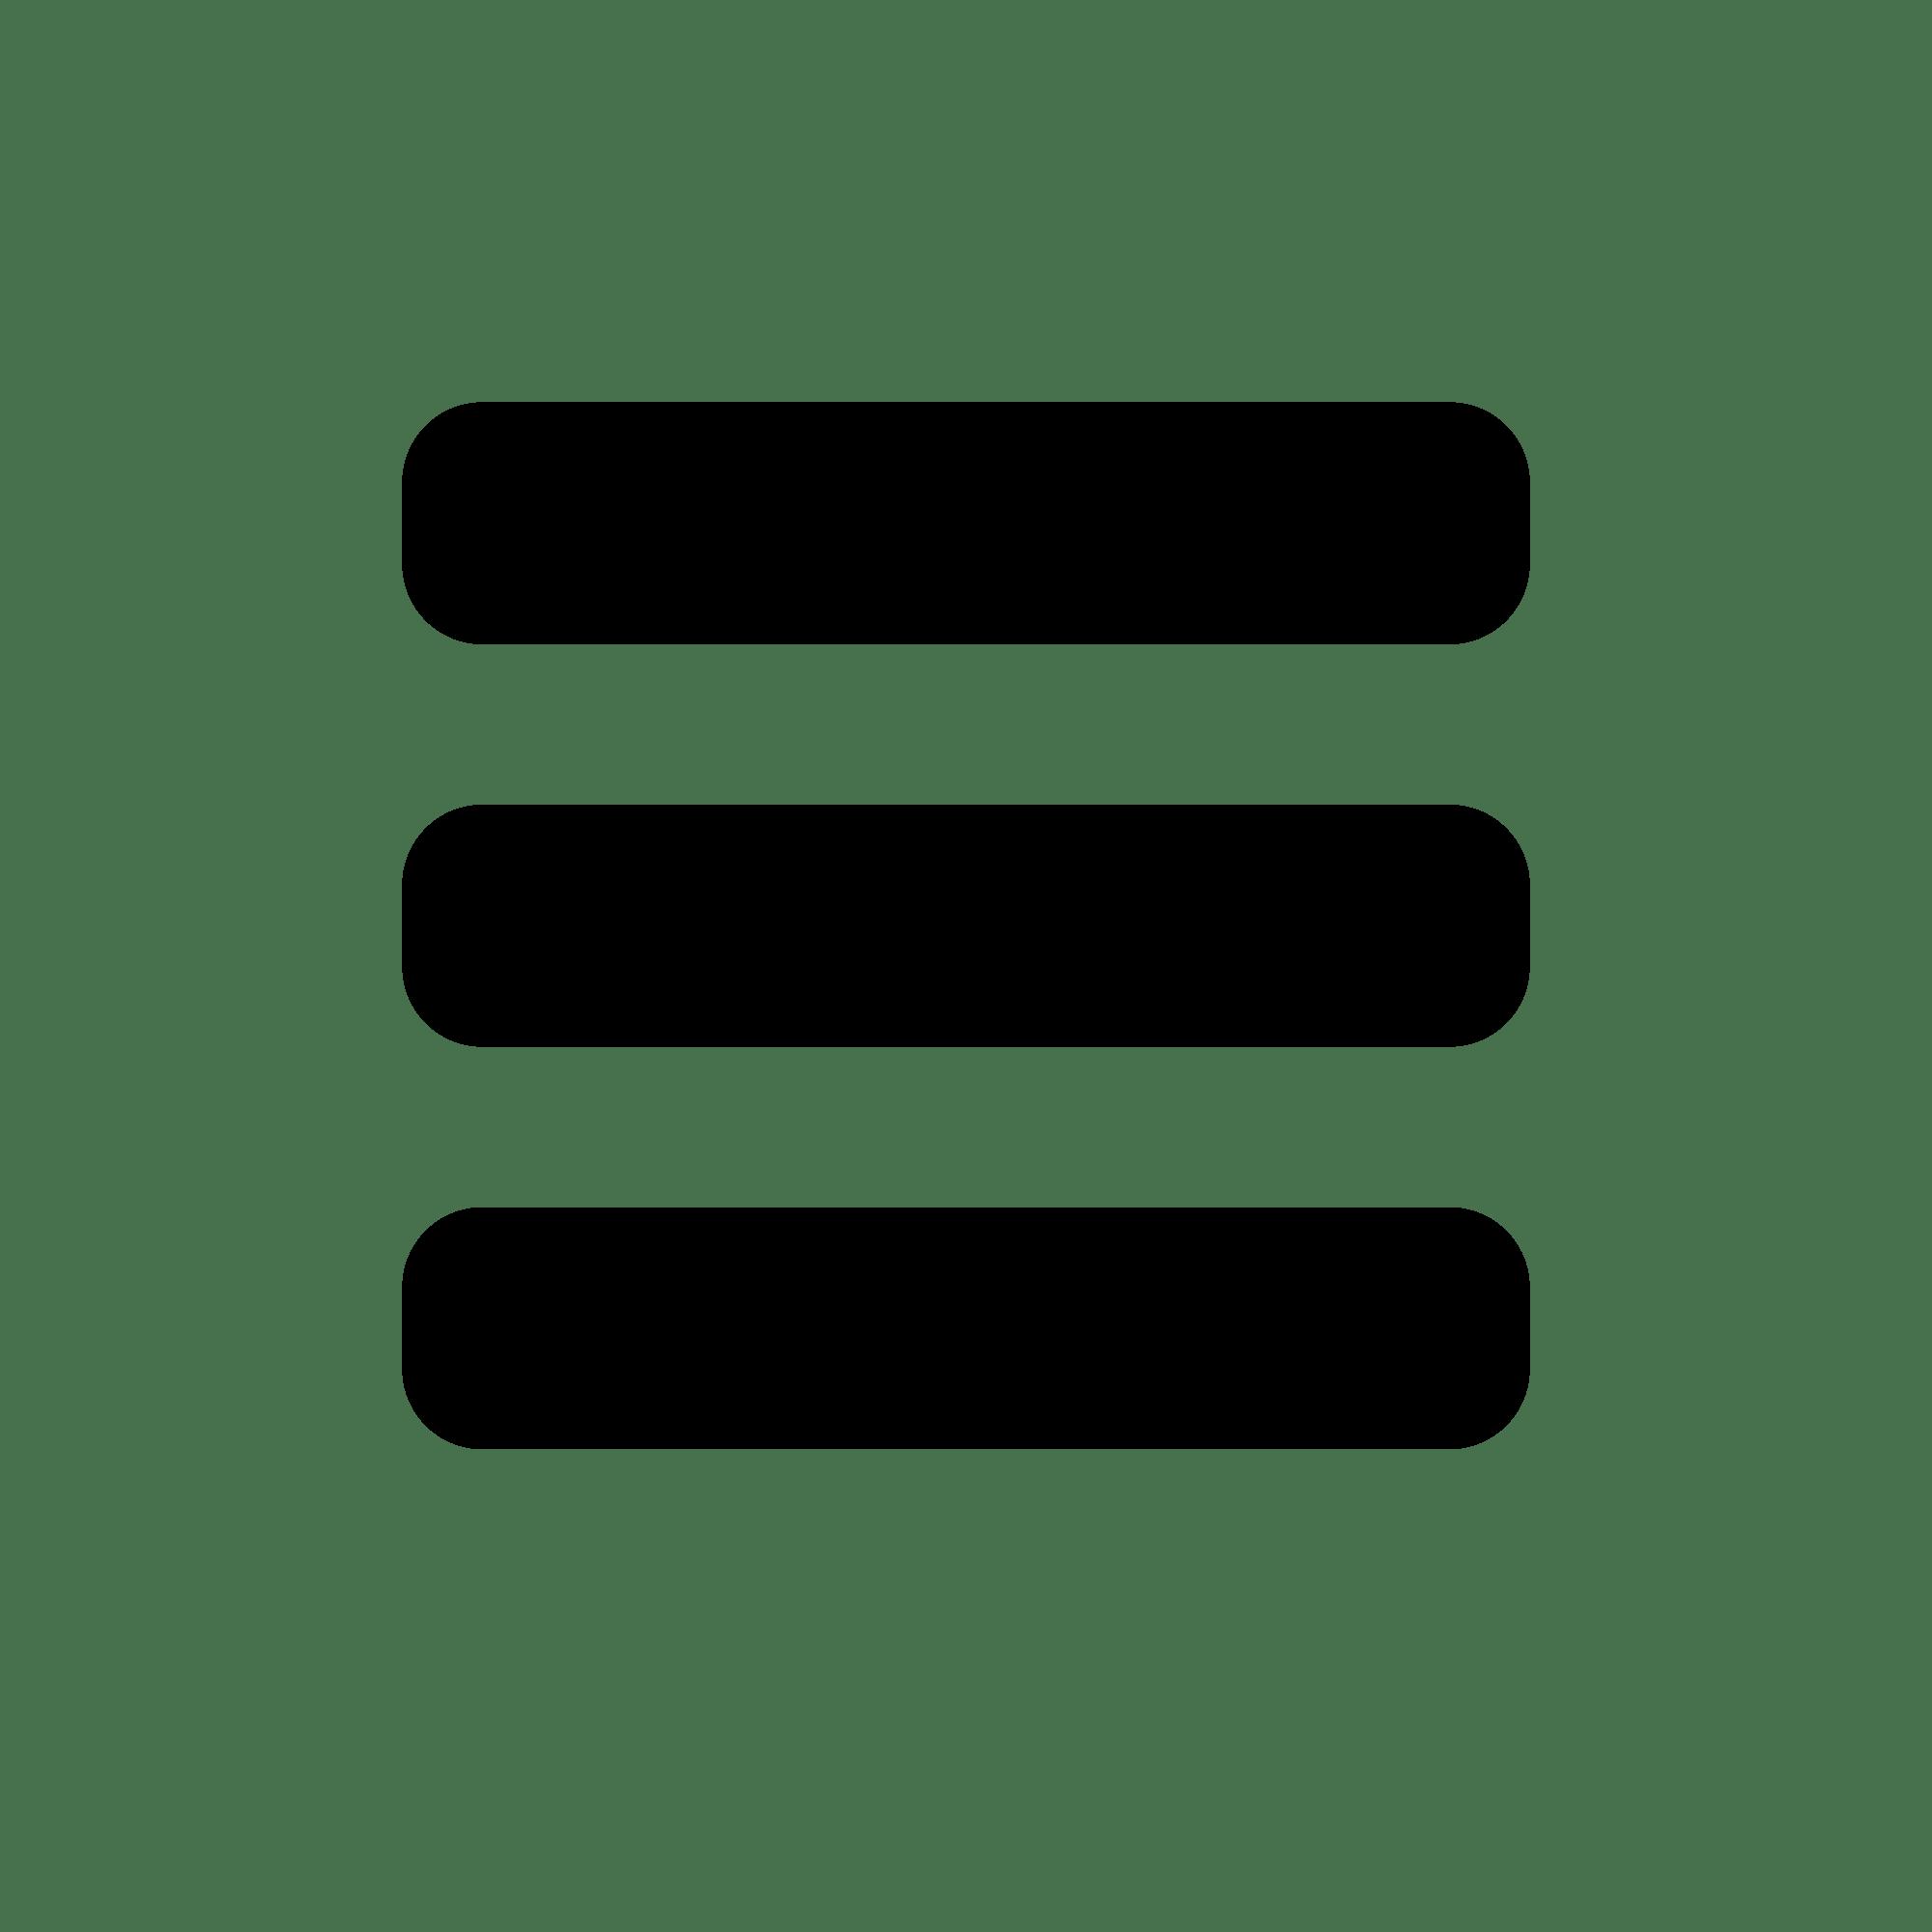 grey menu icon transparent png stickpng